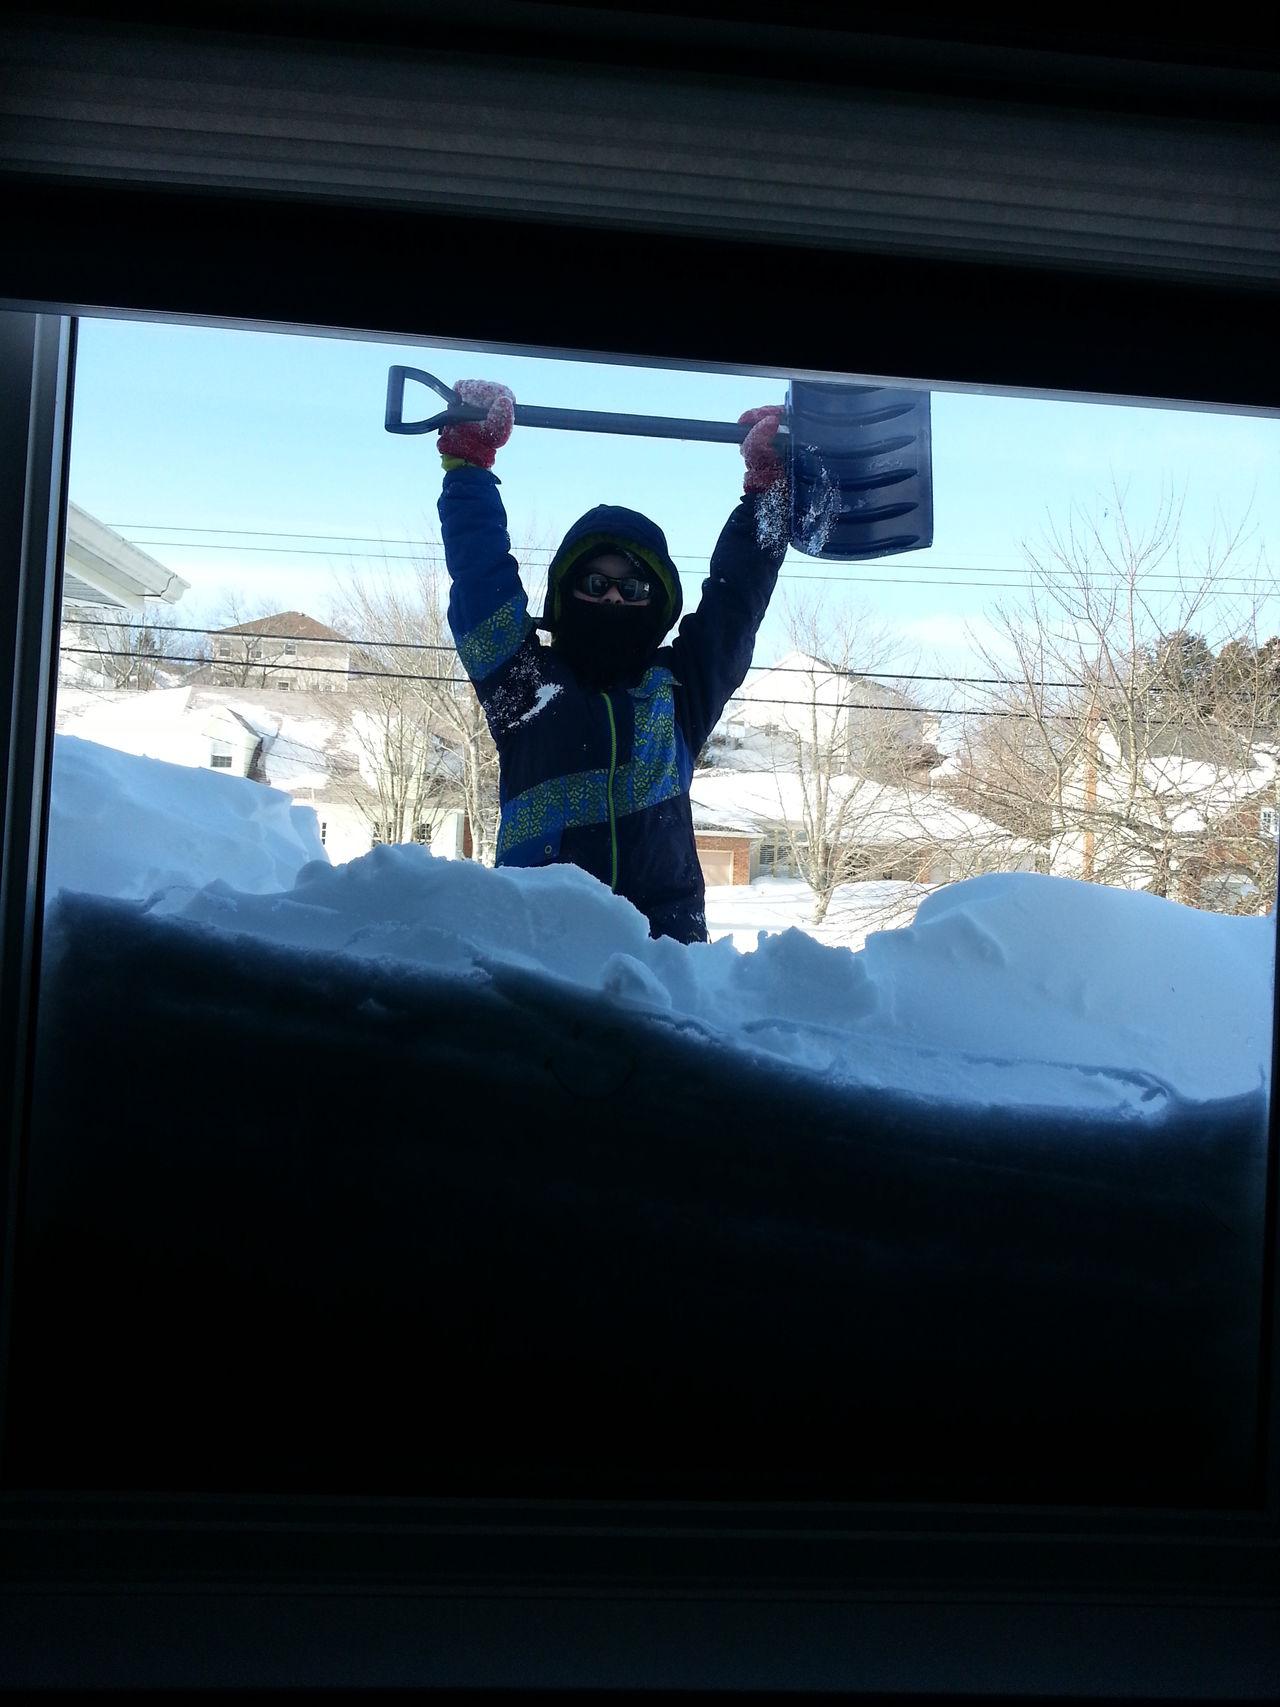 Winter Winteroutsidemywindow Digging Out Snowstorm Man Vs Nature Man Versus Nature Manvsnature  Shovelling Out Shovelling